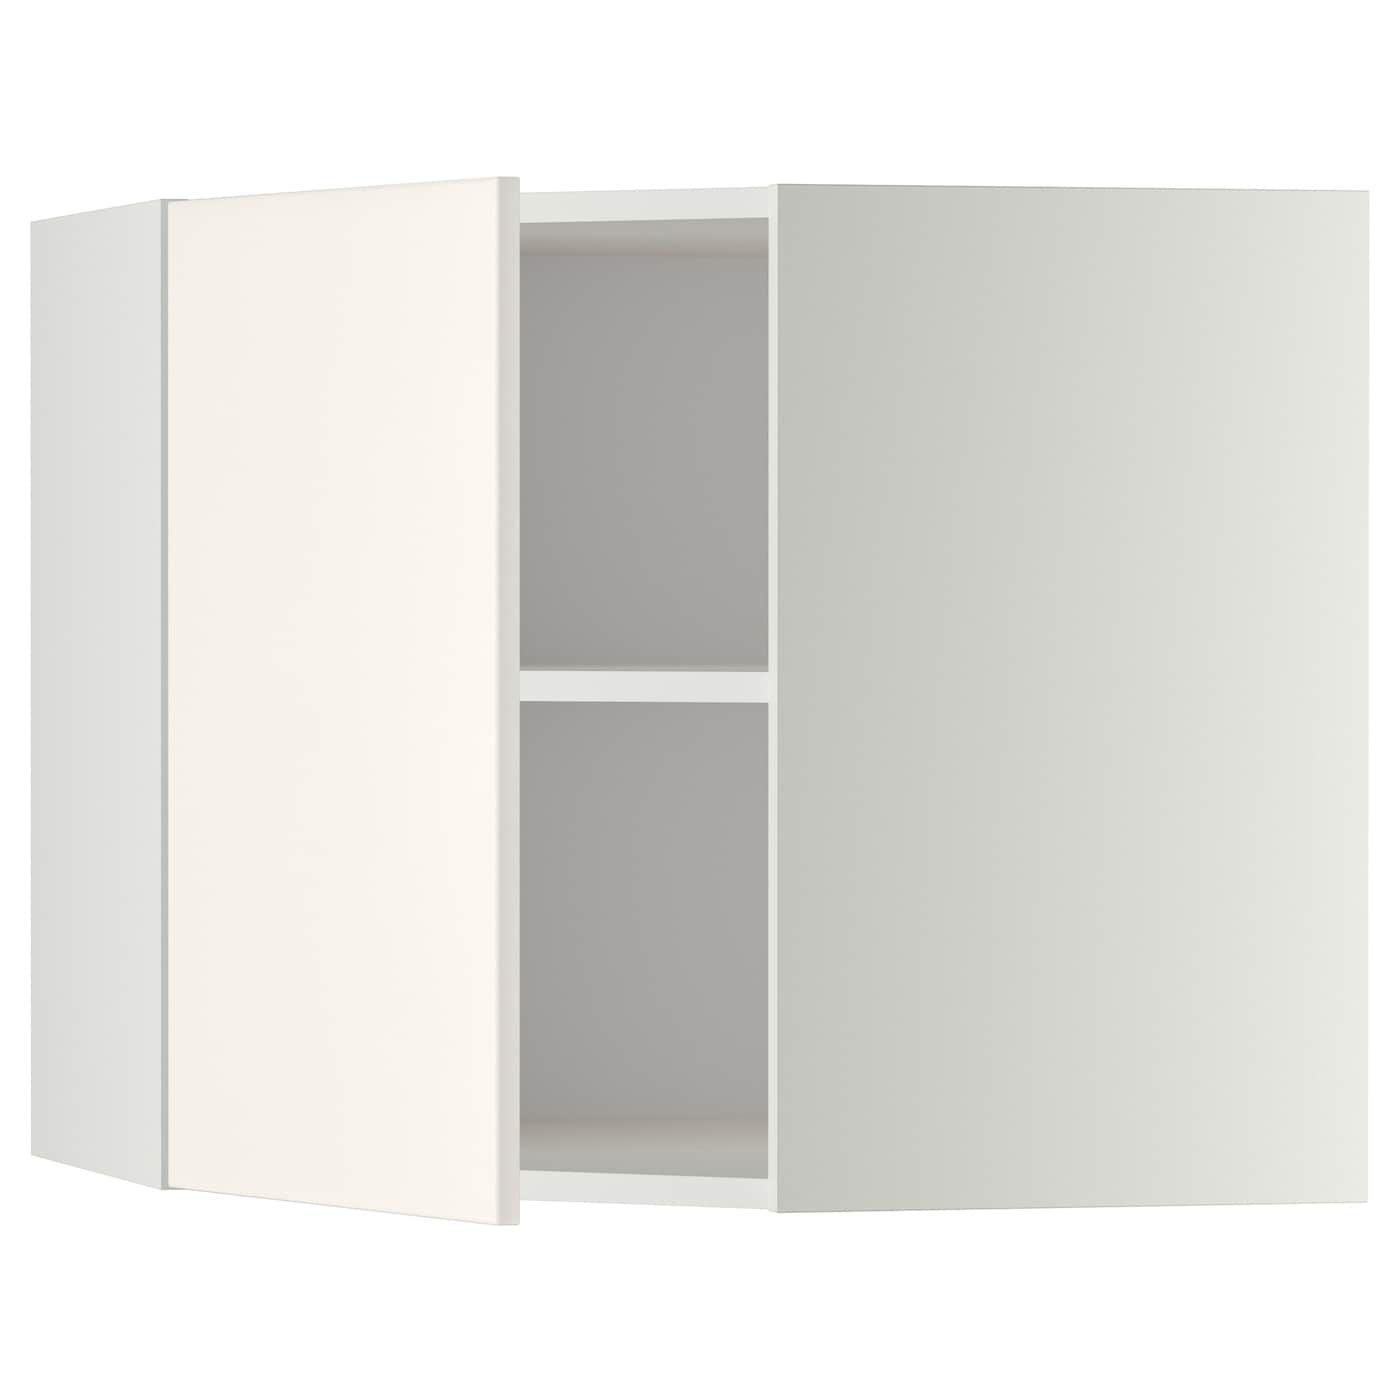 Ikea Kitchen Veddinge White: METOD Corner Wall Cabinet With Shelves White/veddinge